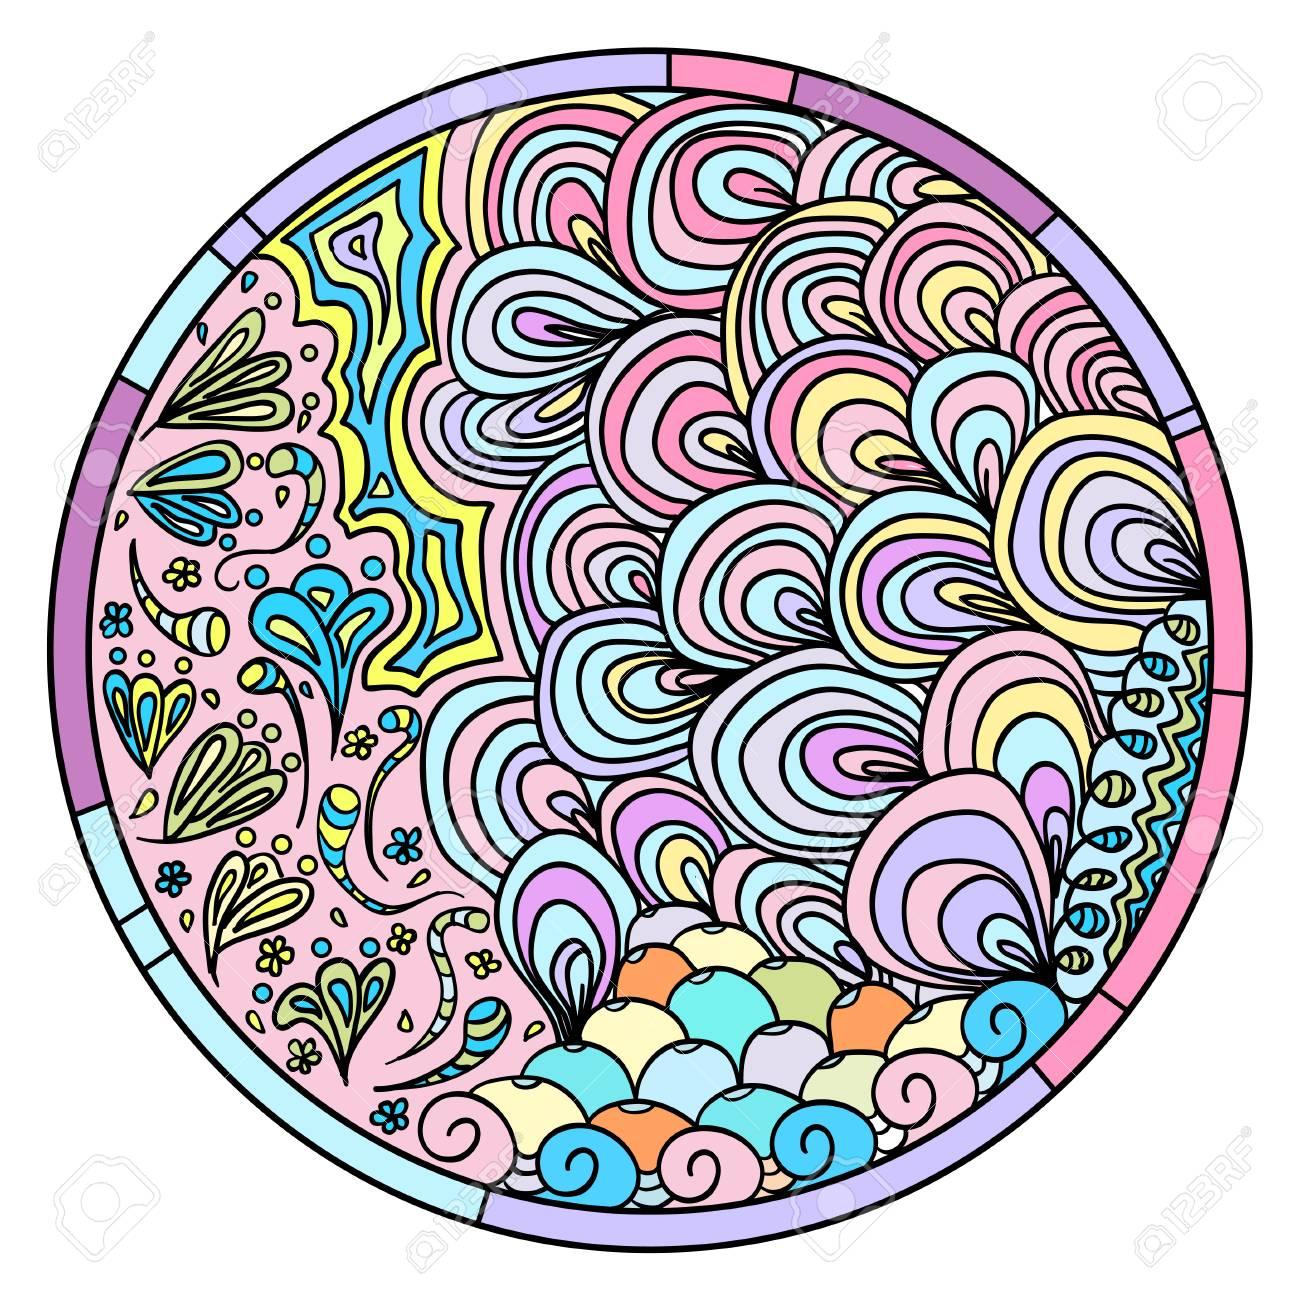 1300x1300 Zendala. Zentangle. Hand Drawn Circle Mandala With Abstract